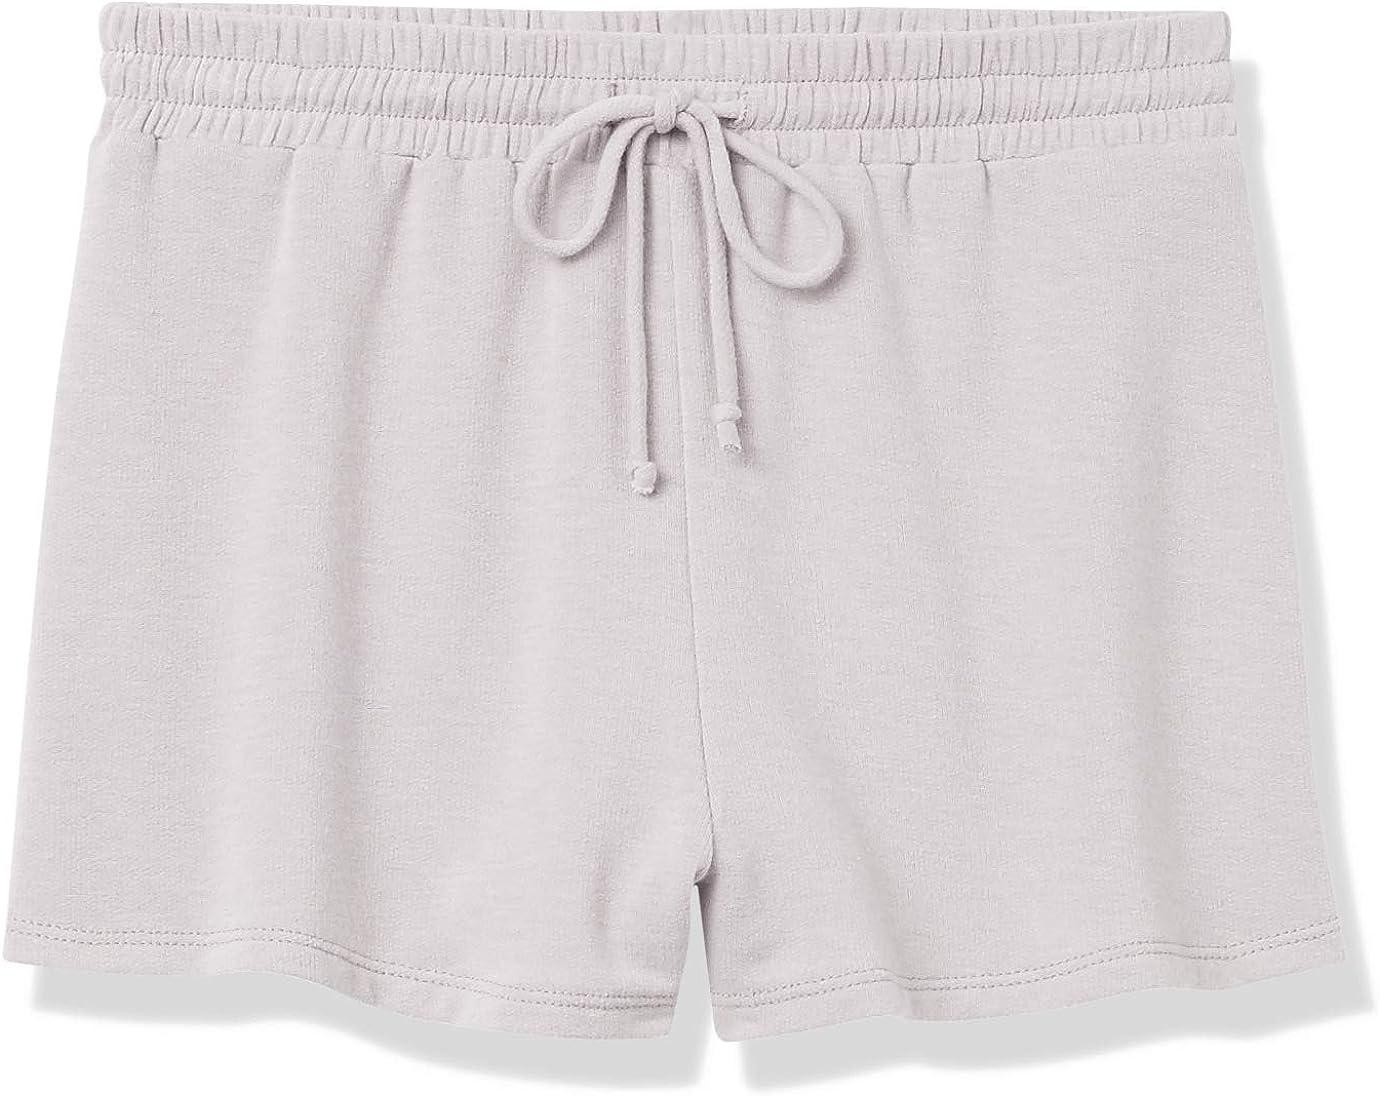 Hoodie, Sweatpant, Sweatshort Brand Wild Meadow Womens Mix /& Match Lightweight French Terry Loungewear Separates